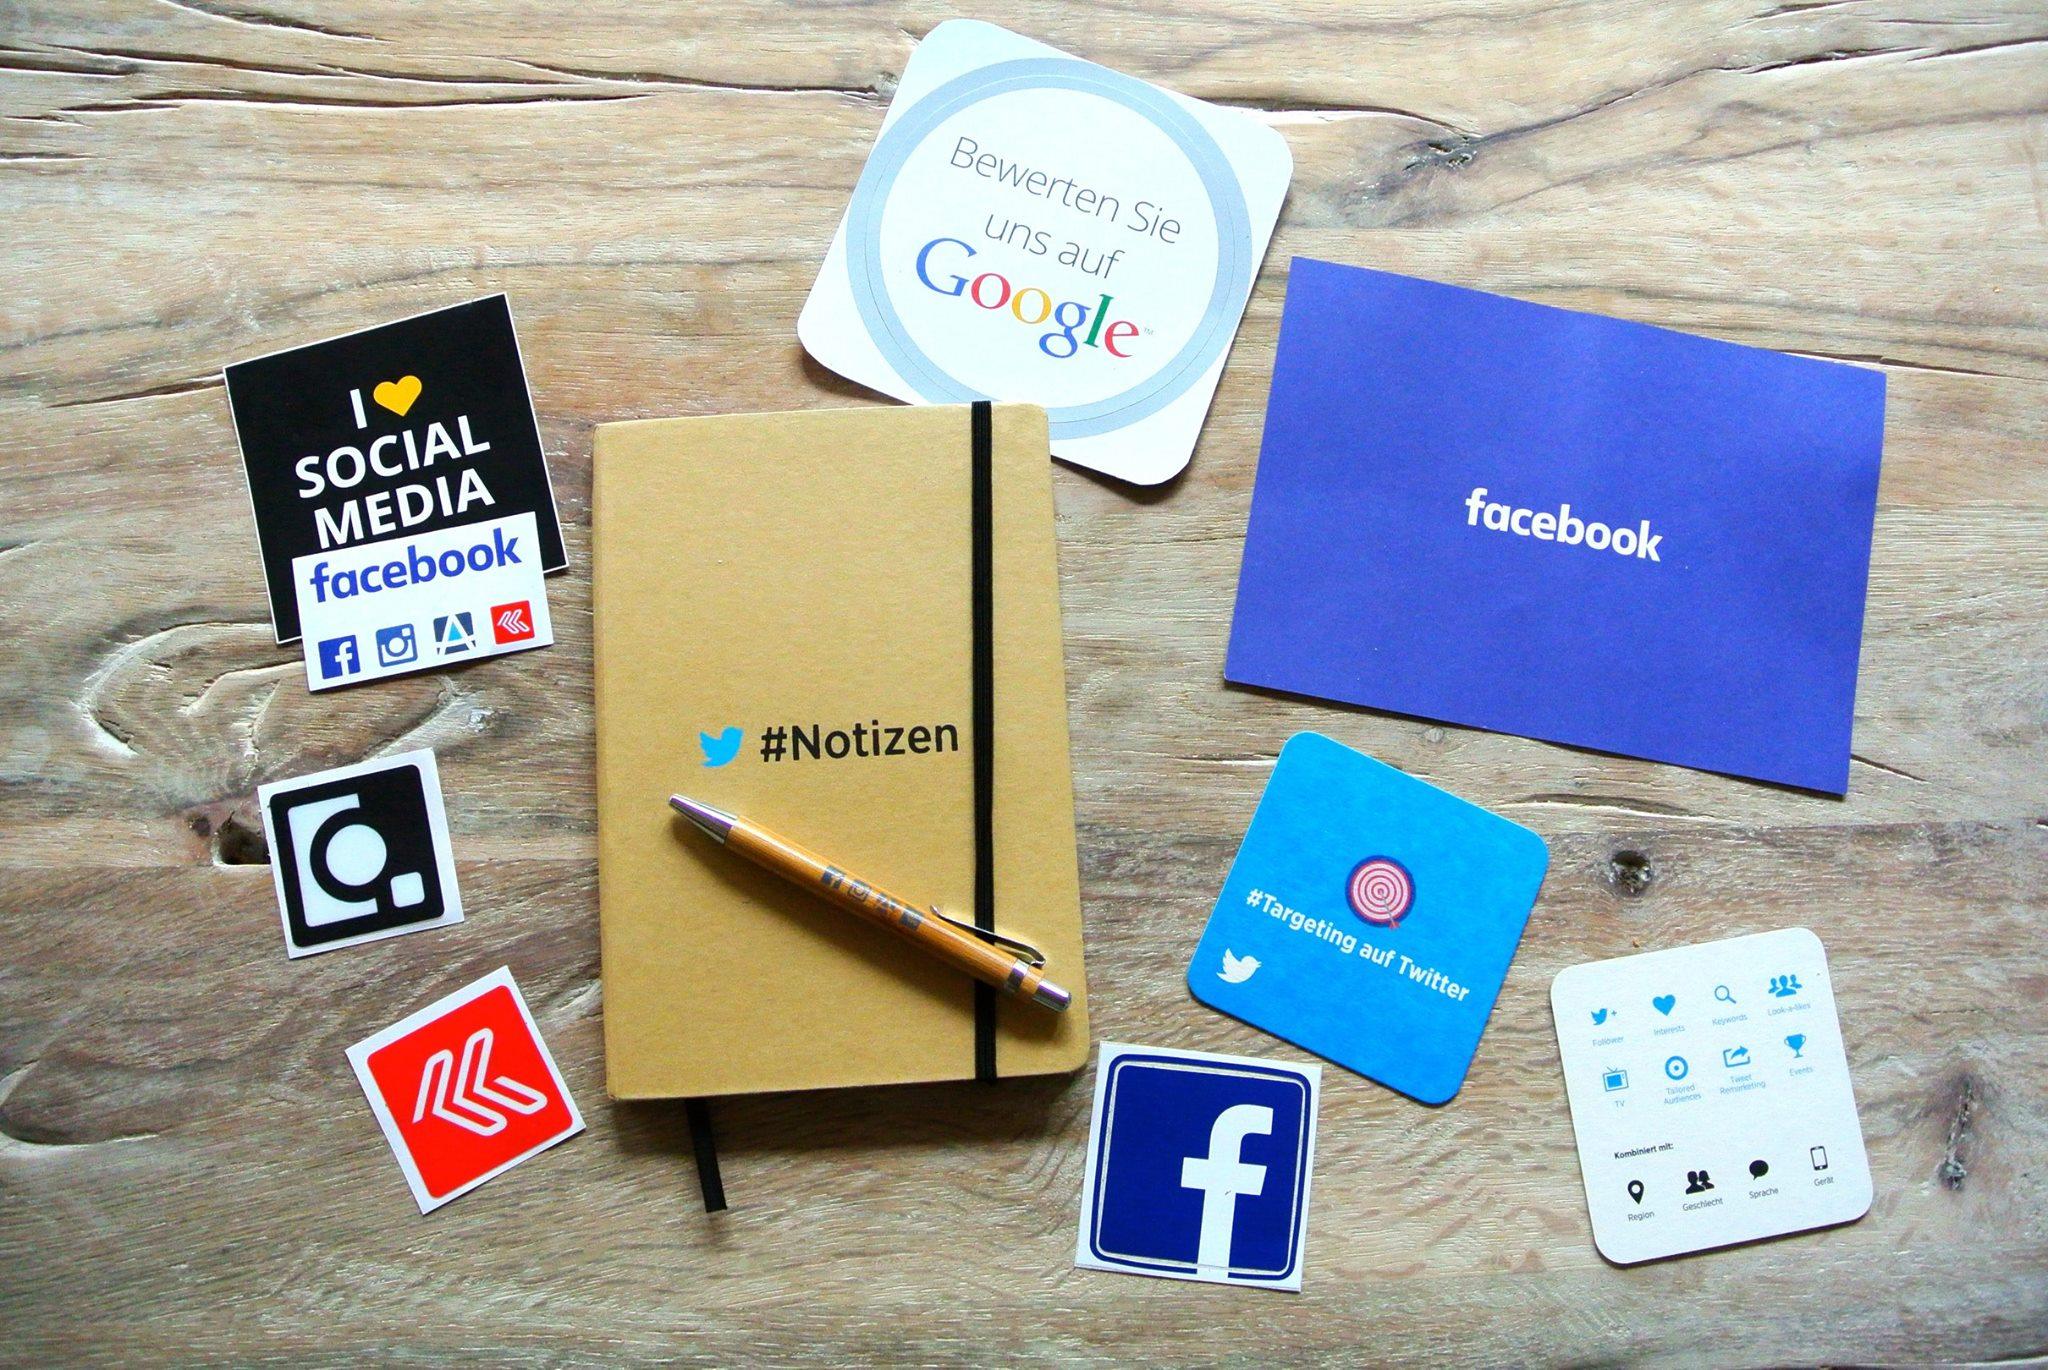 Scherwat Gevelsberg: Social Media Veranstaltung